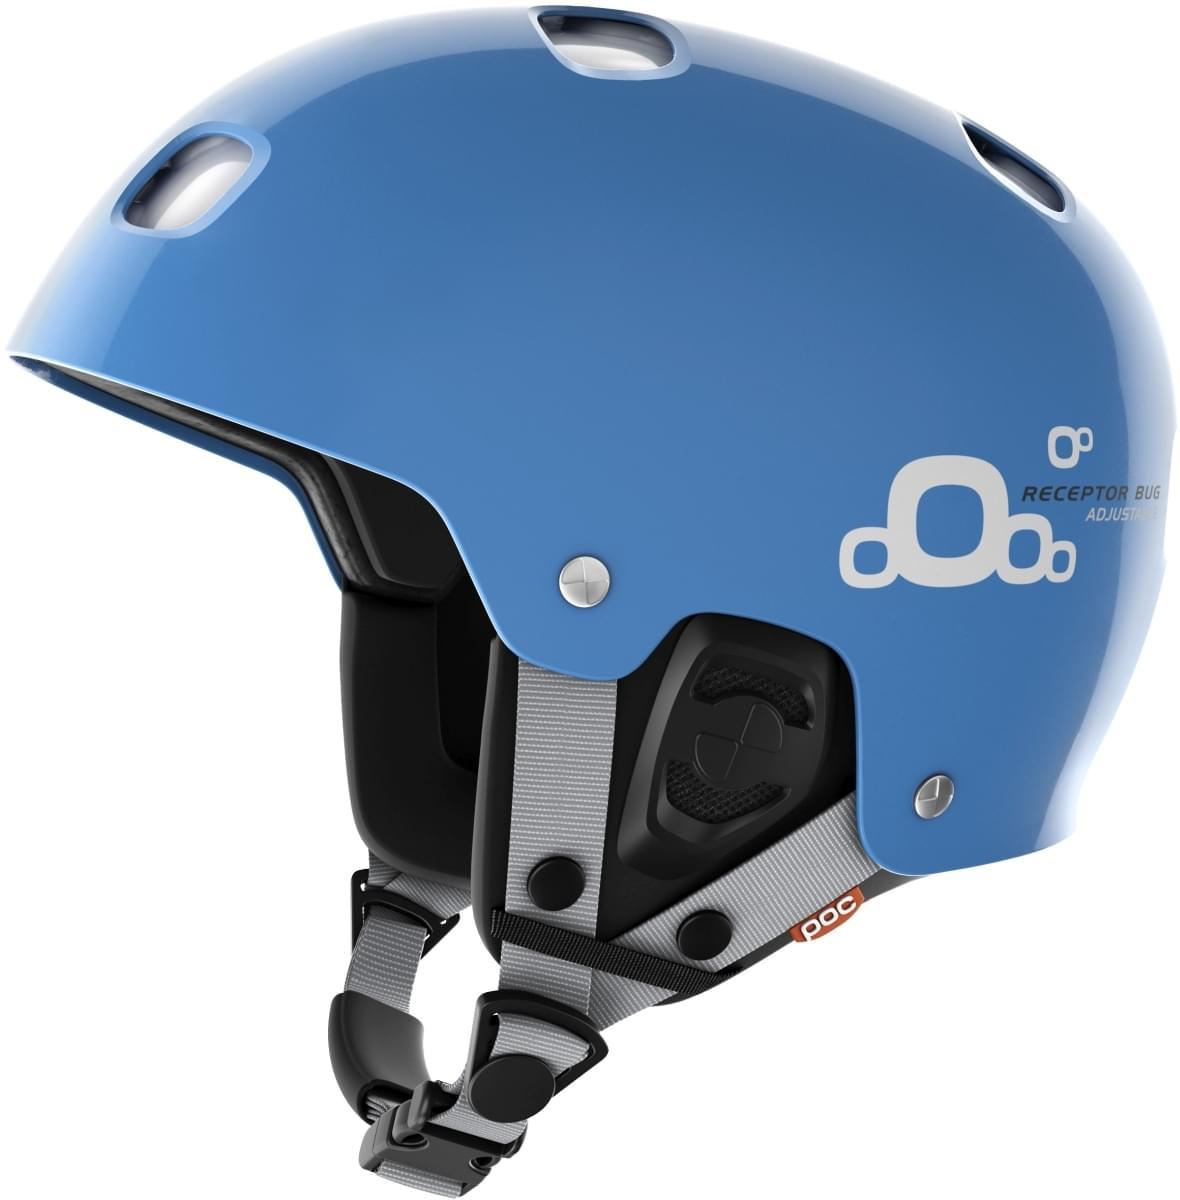 POC Receptor BUG Adjustable 2.0 - niob blue M-L